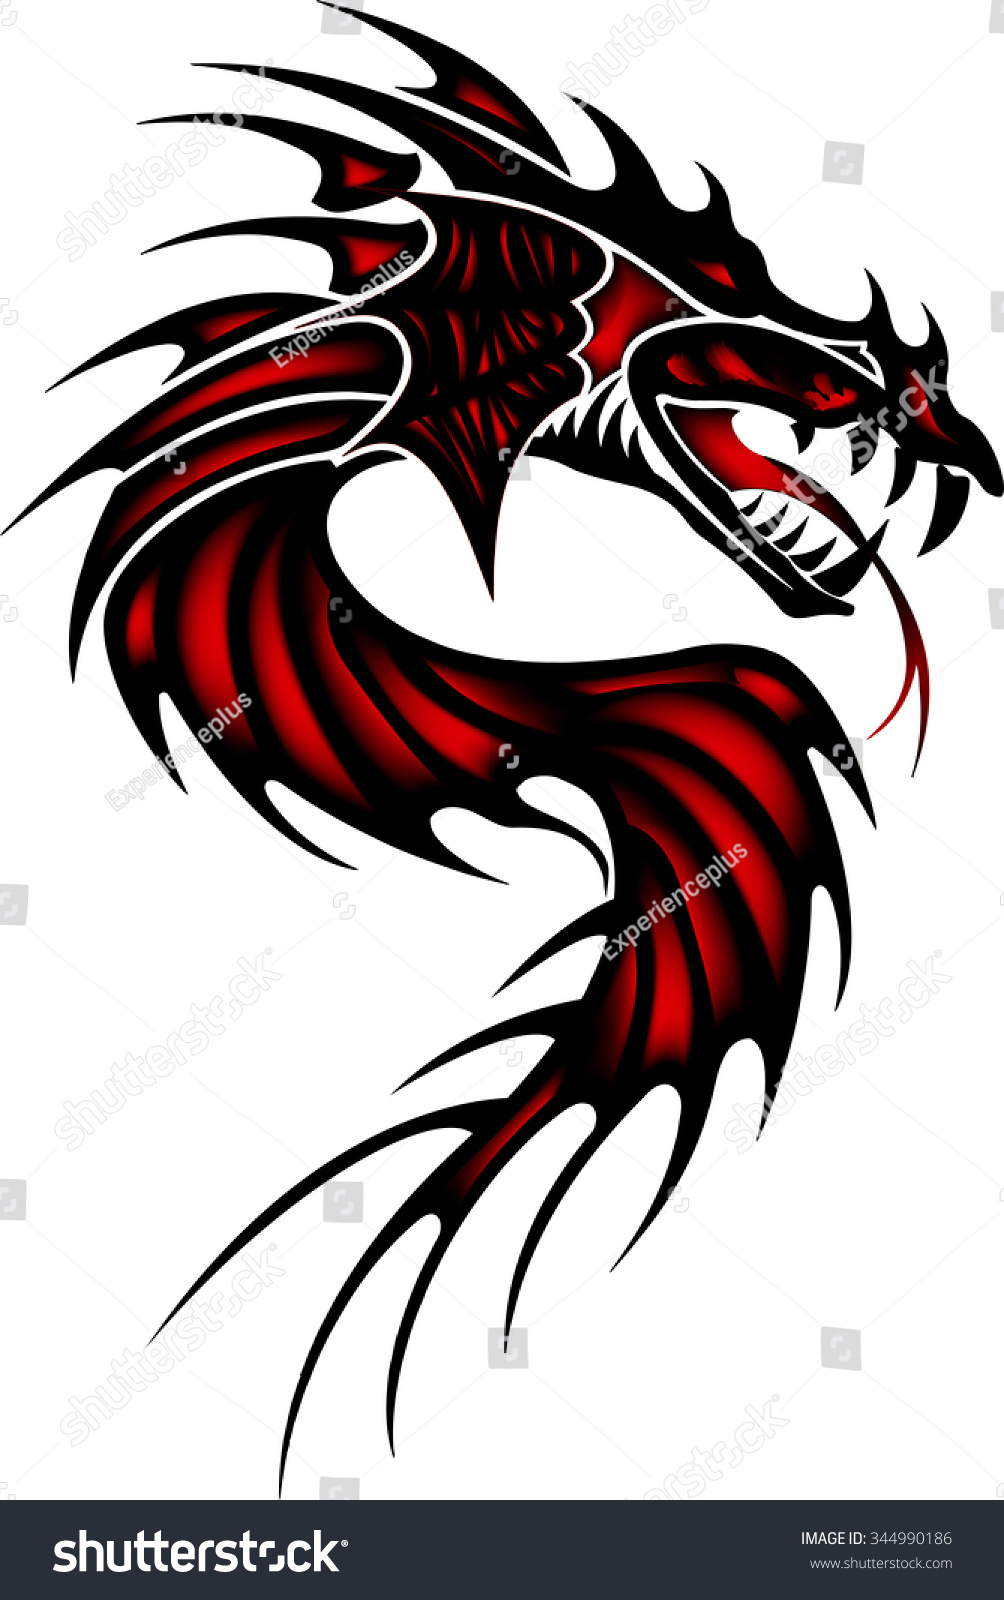 Дракон тату эскиз черно